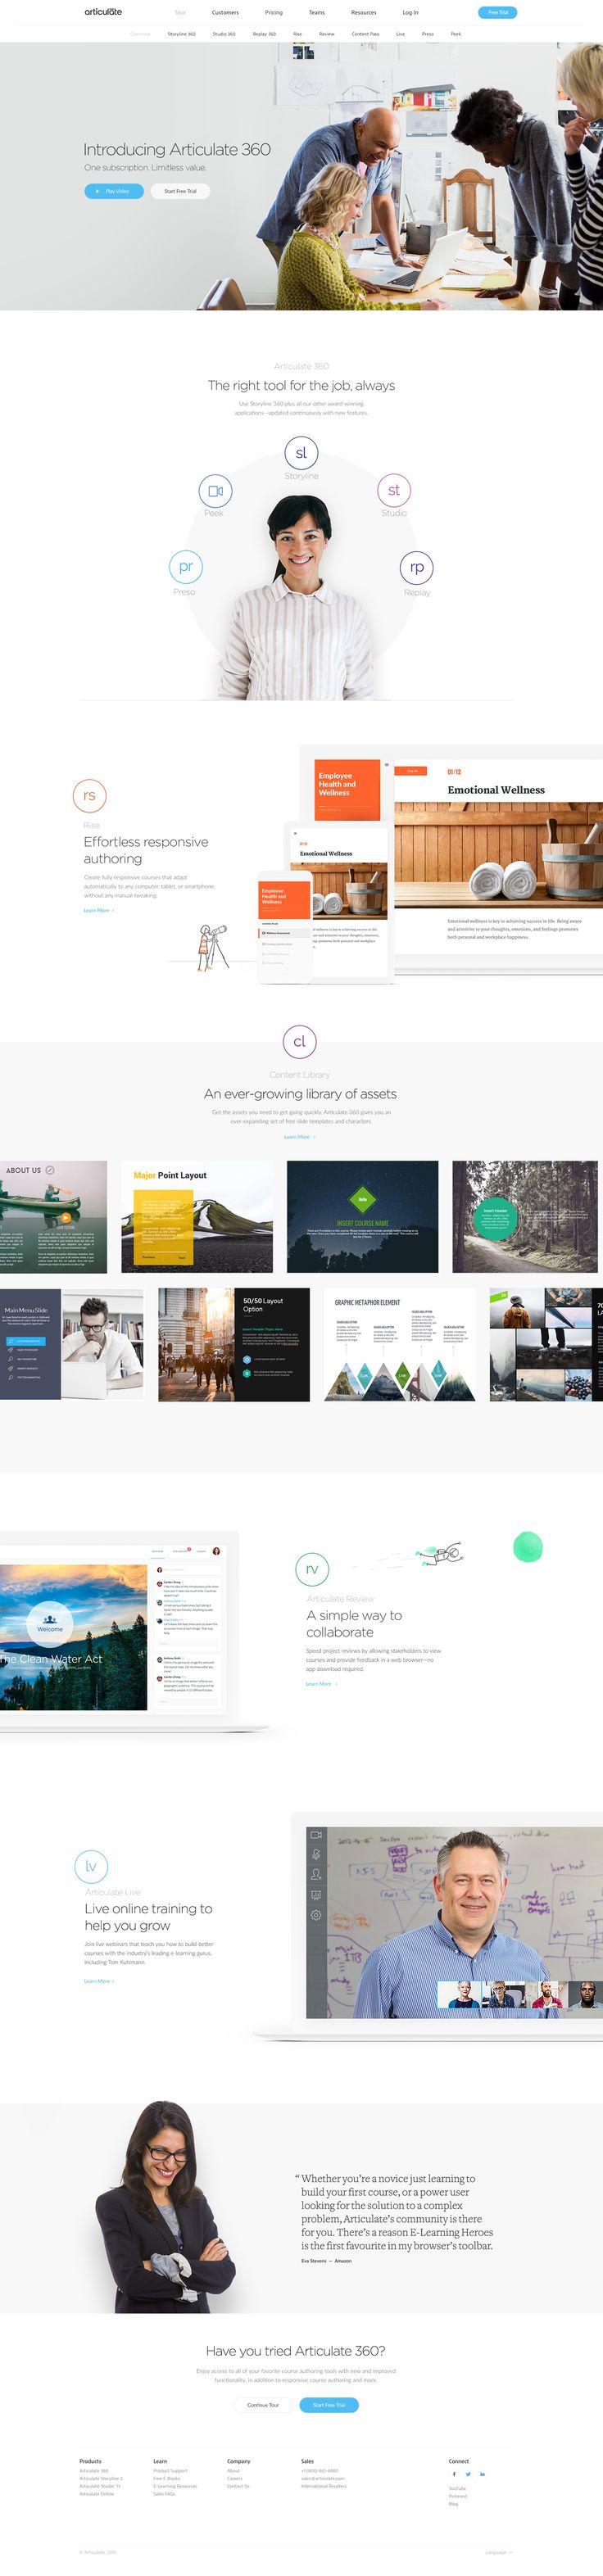 16 best SaaS landing page images on Pinterest | Website designs ...